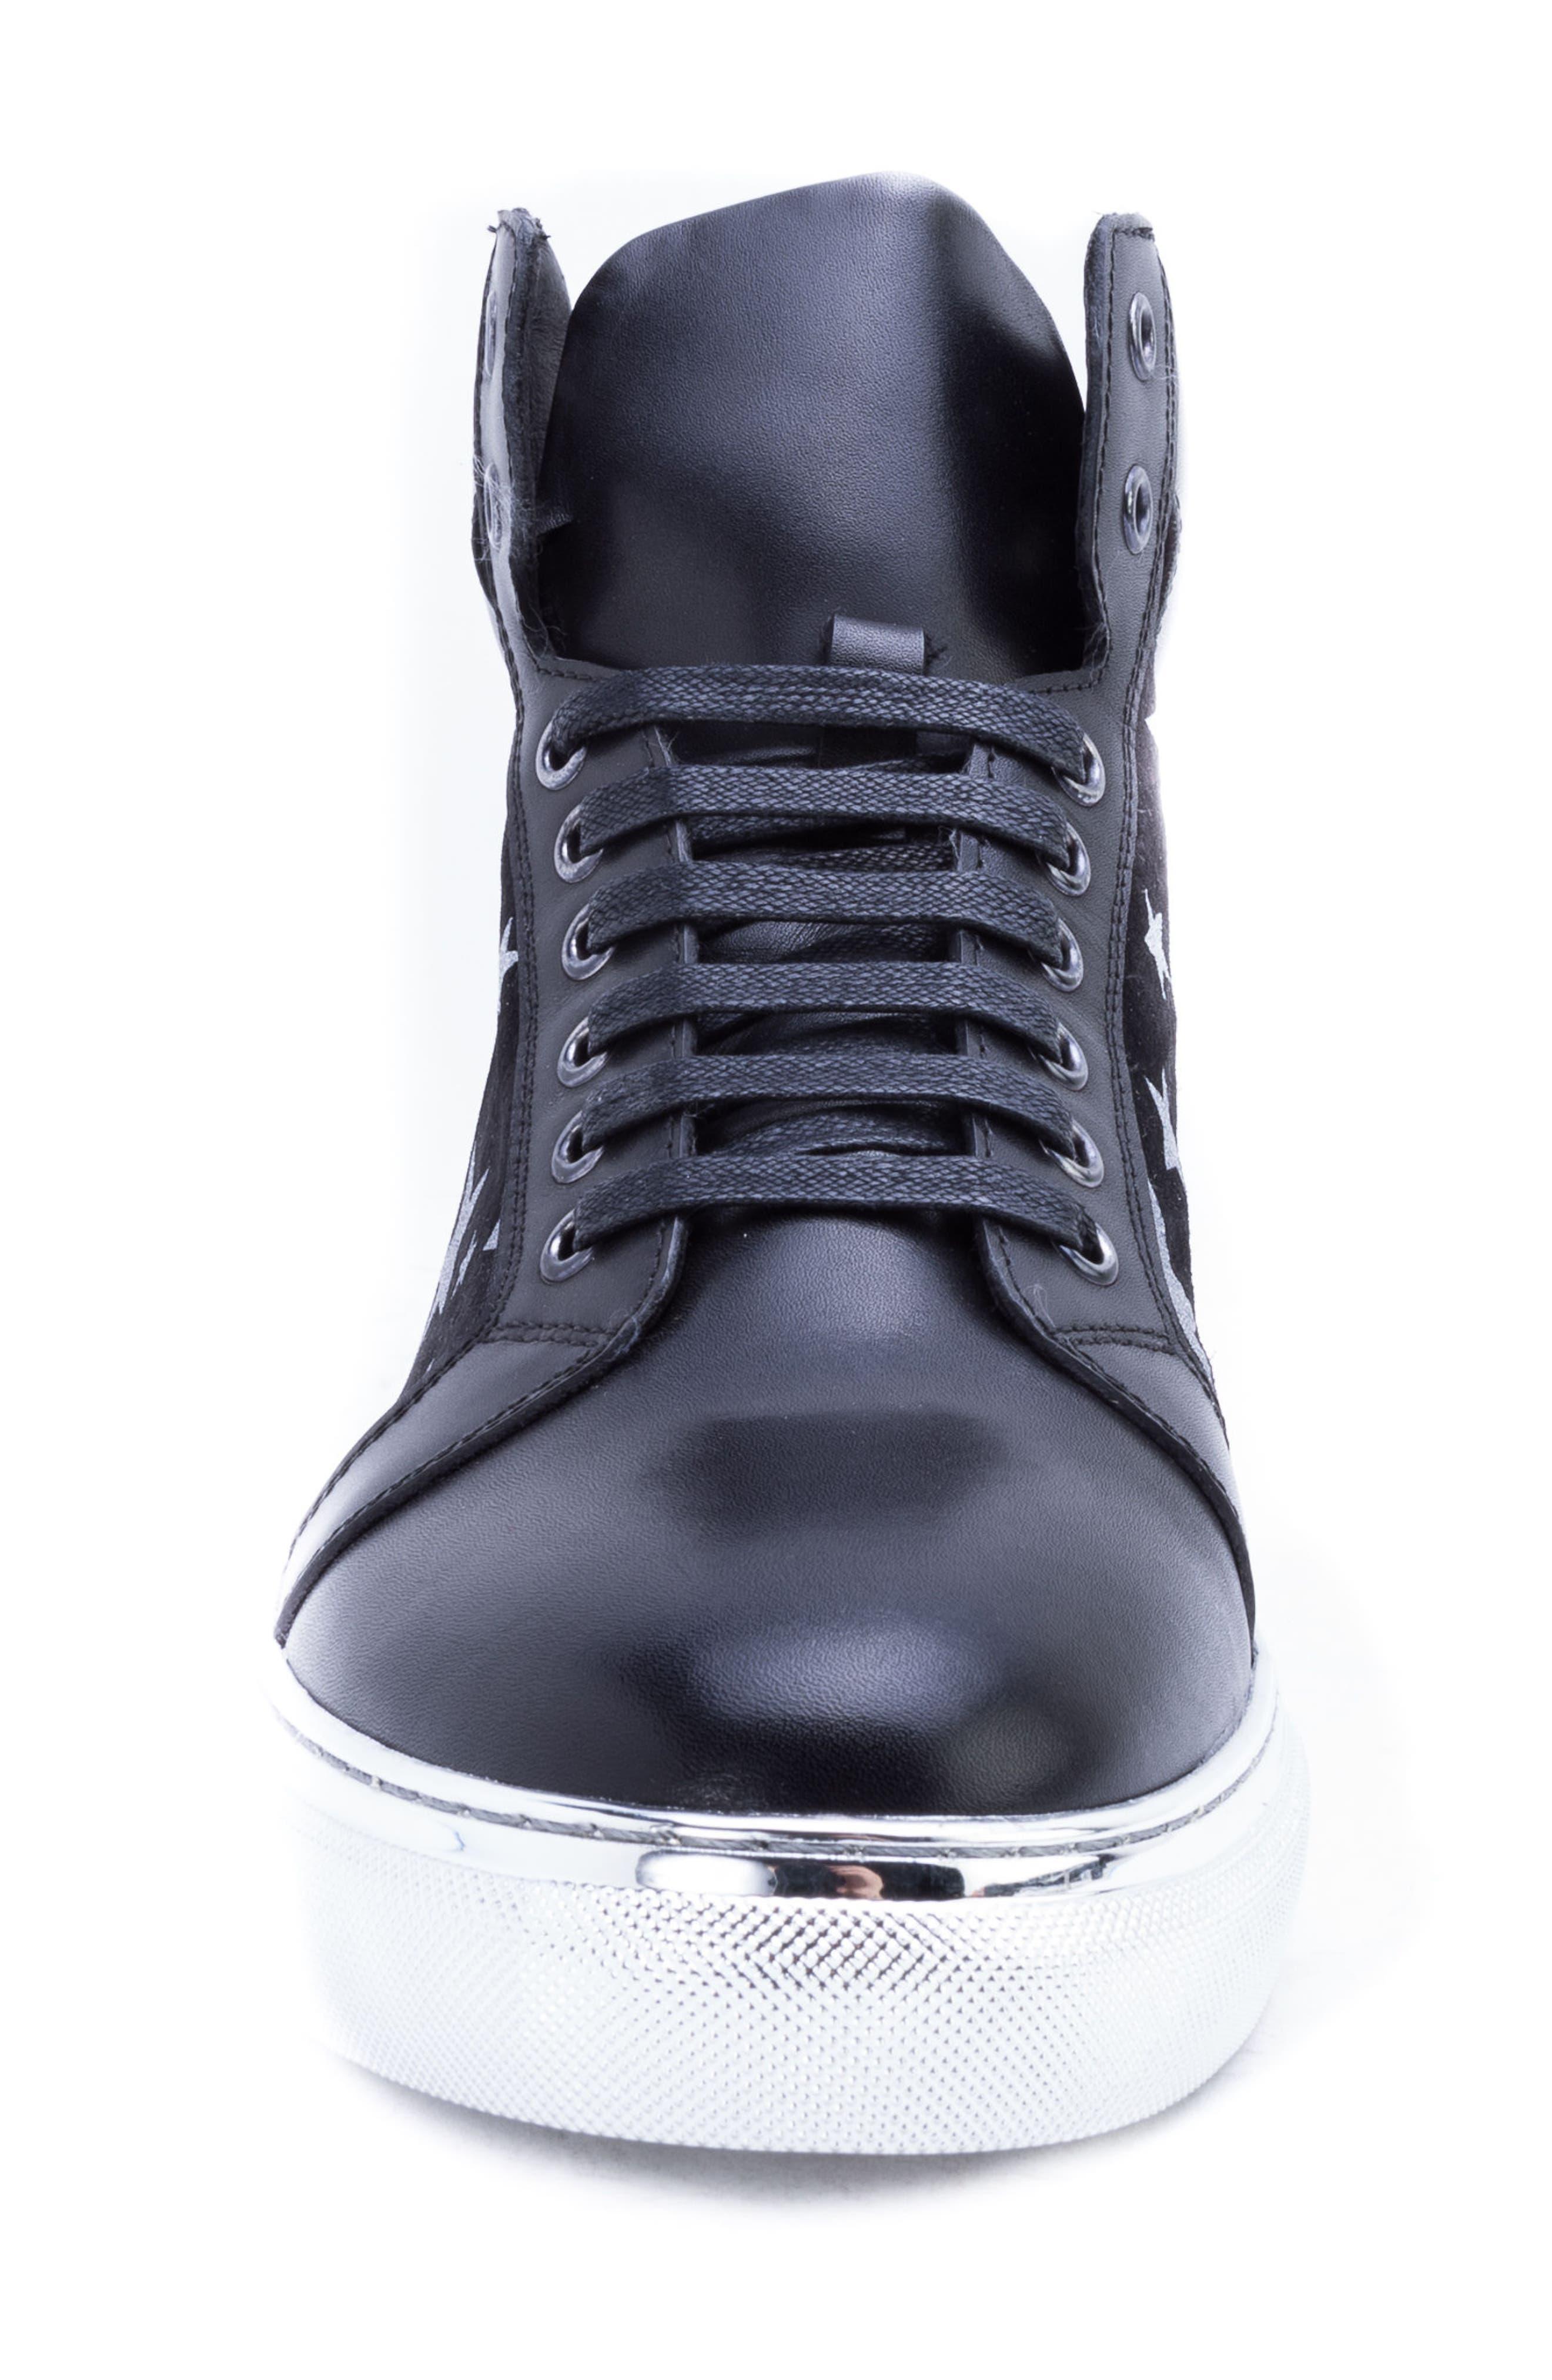 Garner Sneaker,                             Alternate thumbnail 4, color,                             SILVER LEATHER/ SUEDE